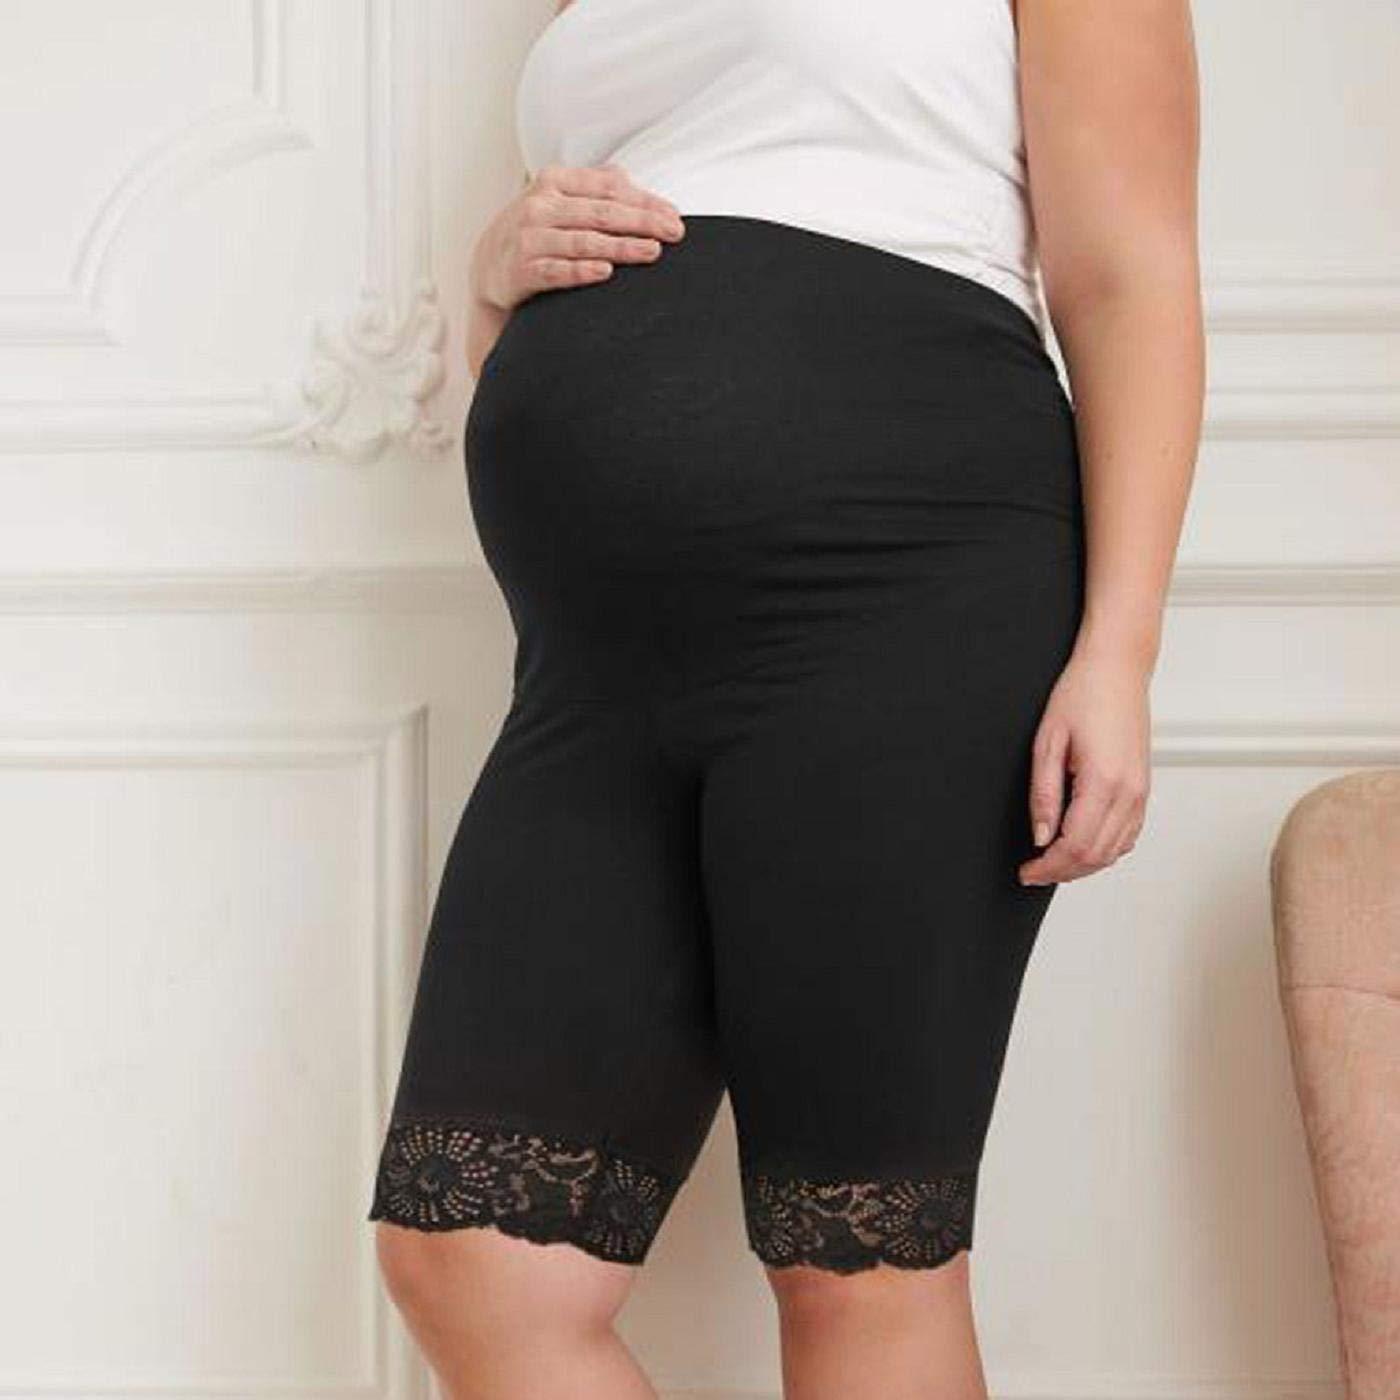 Barlingrock Women Under The Bump Maternity Panties Pregnancy Leggings Underwear,Maternity Mid-Rise Shortie Shorts,Mother Comfy Cotton Underwear Short Pants Briefs